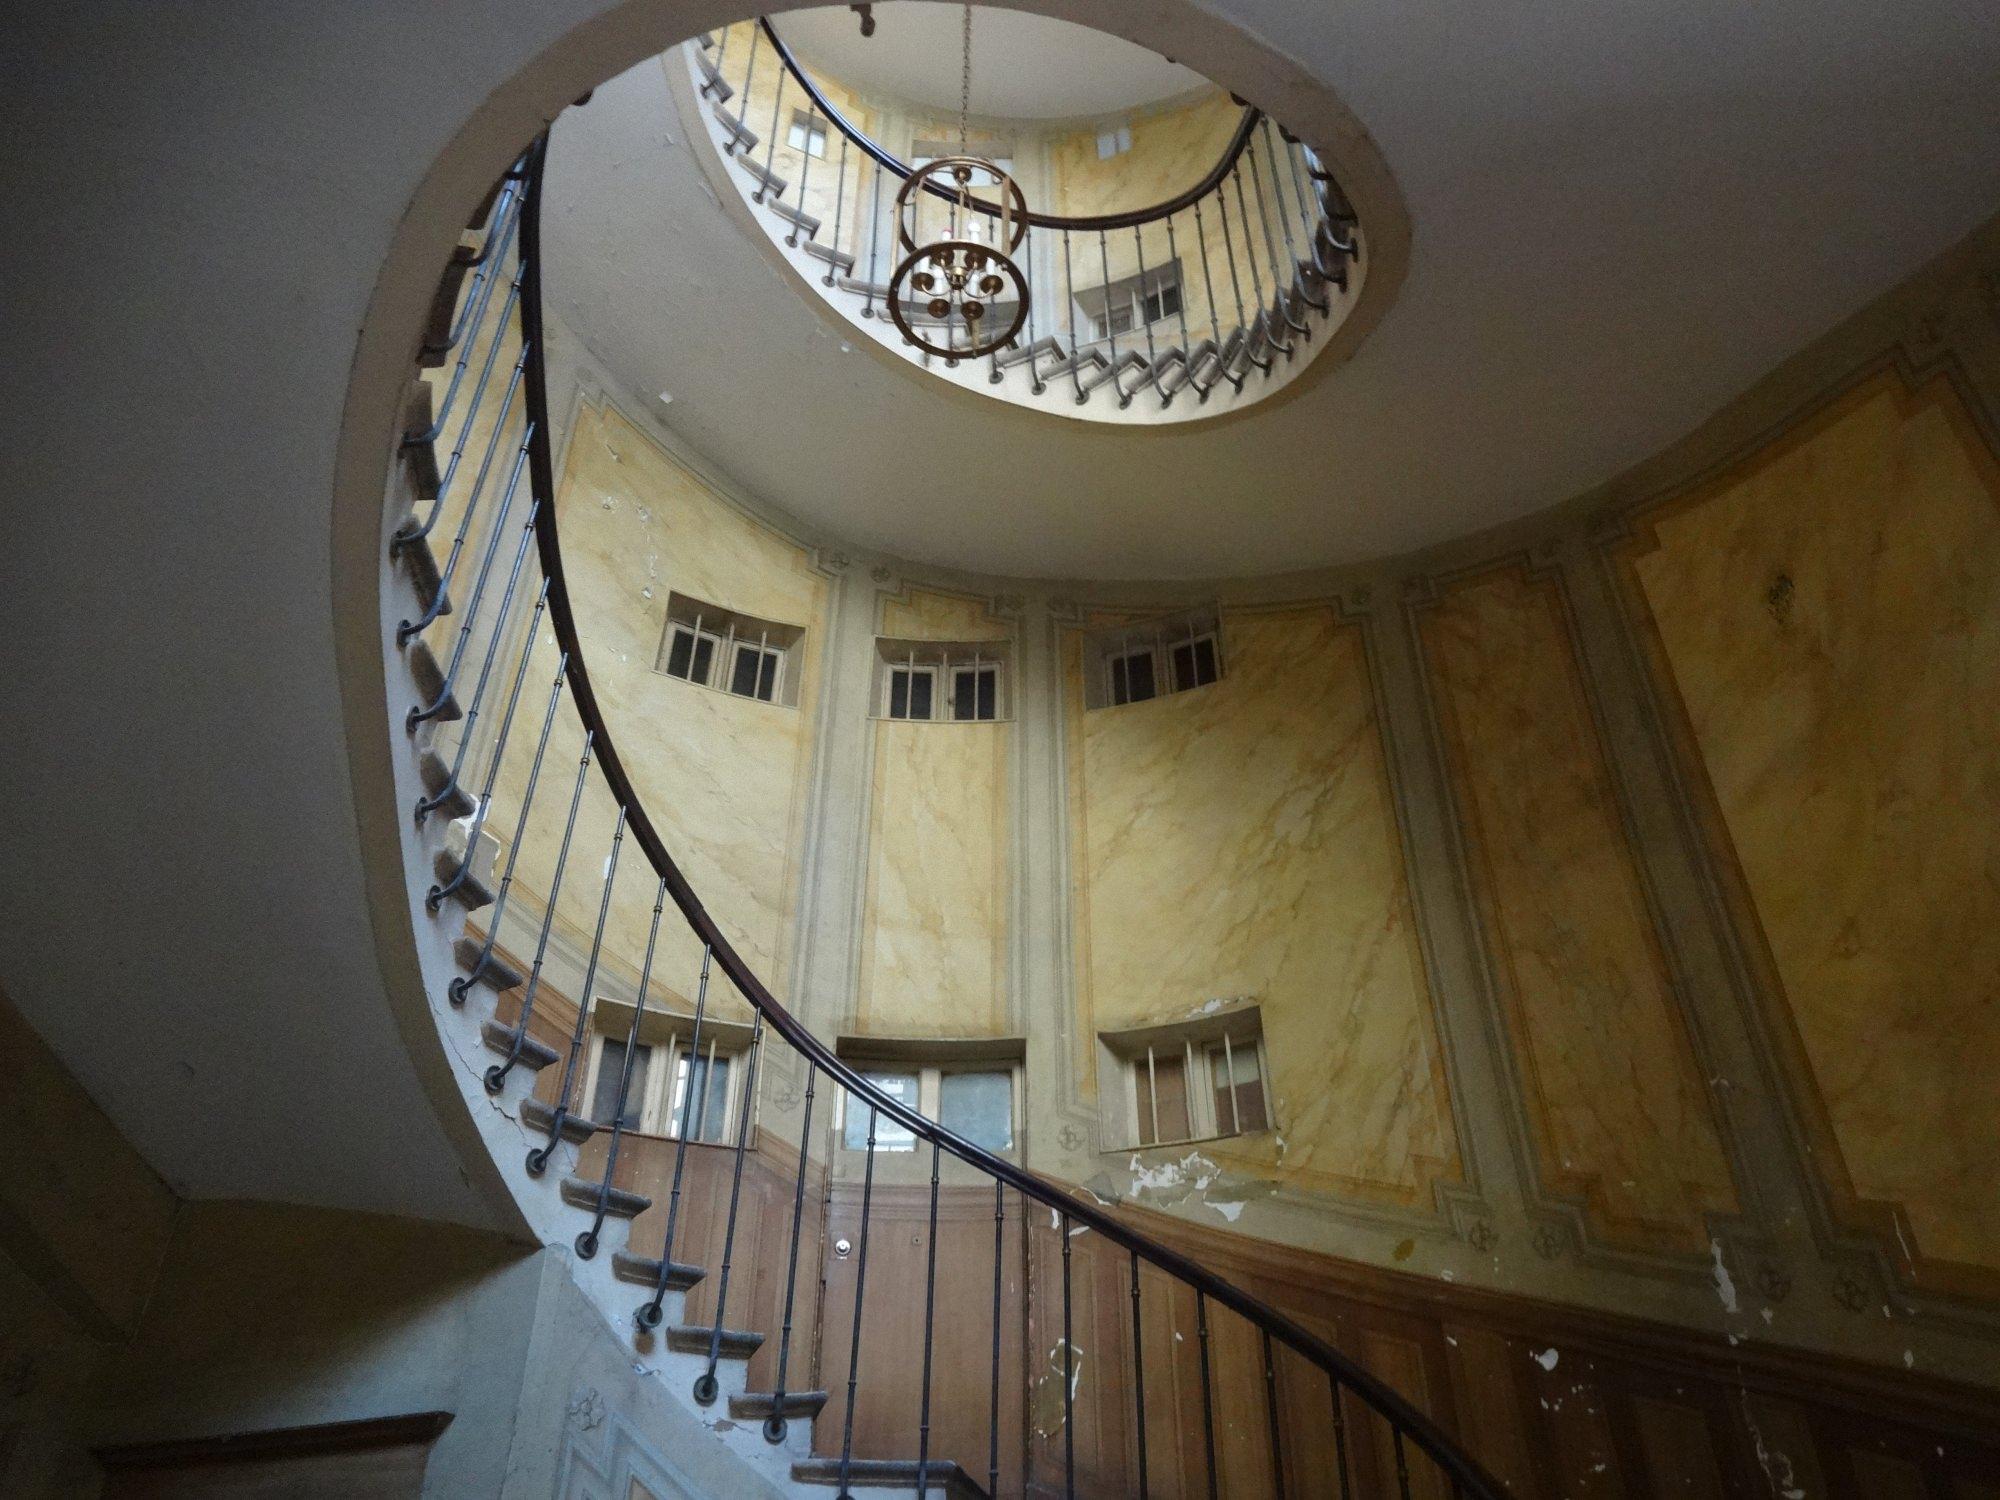 Escalier. Chez Totleben. Created by Ivan Stanev